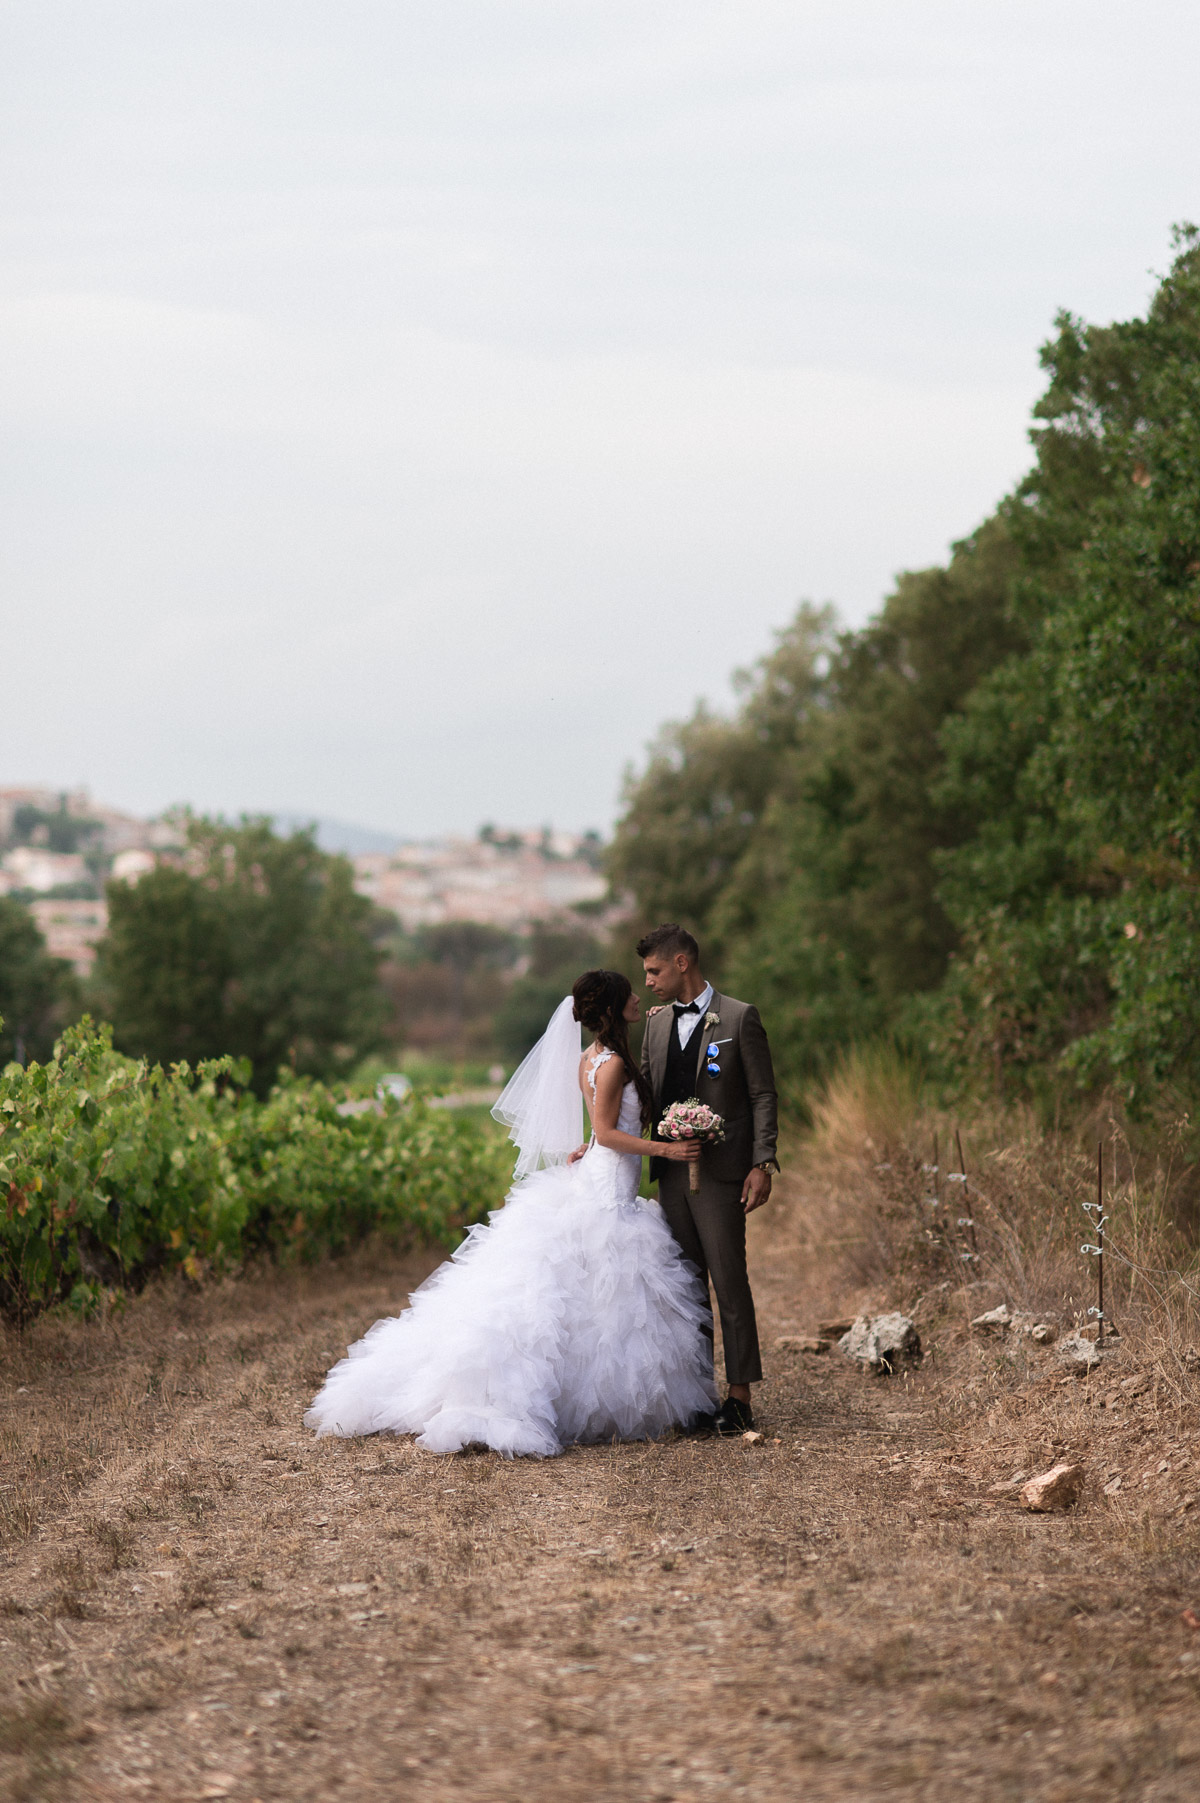 mariage-toulon-mas-du-pourret-christophe-serrano-136